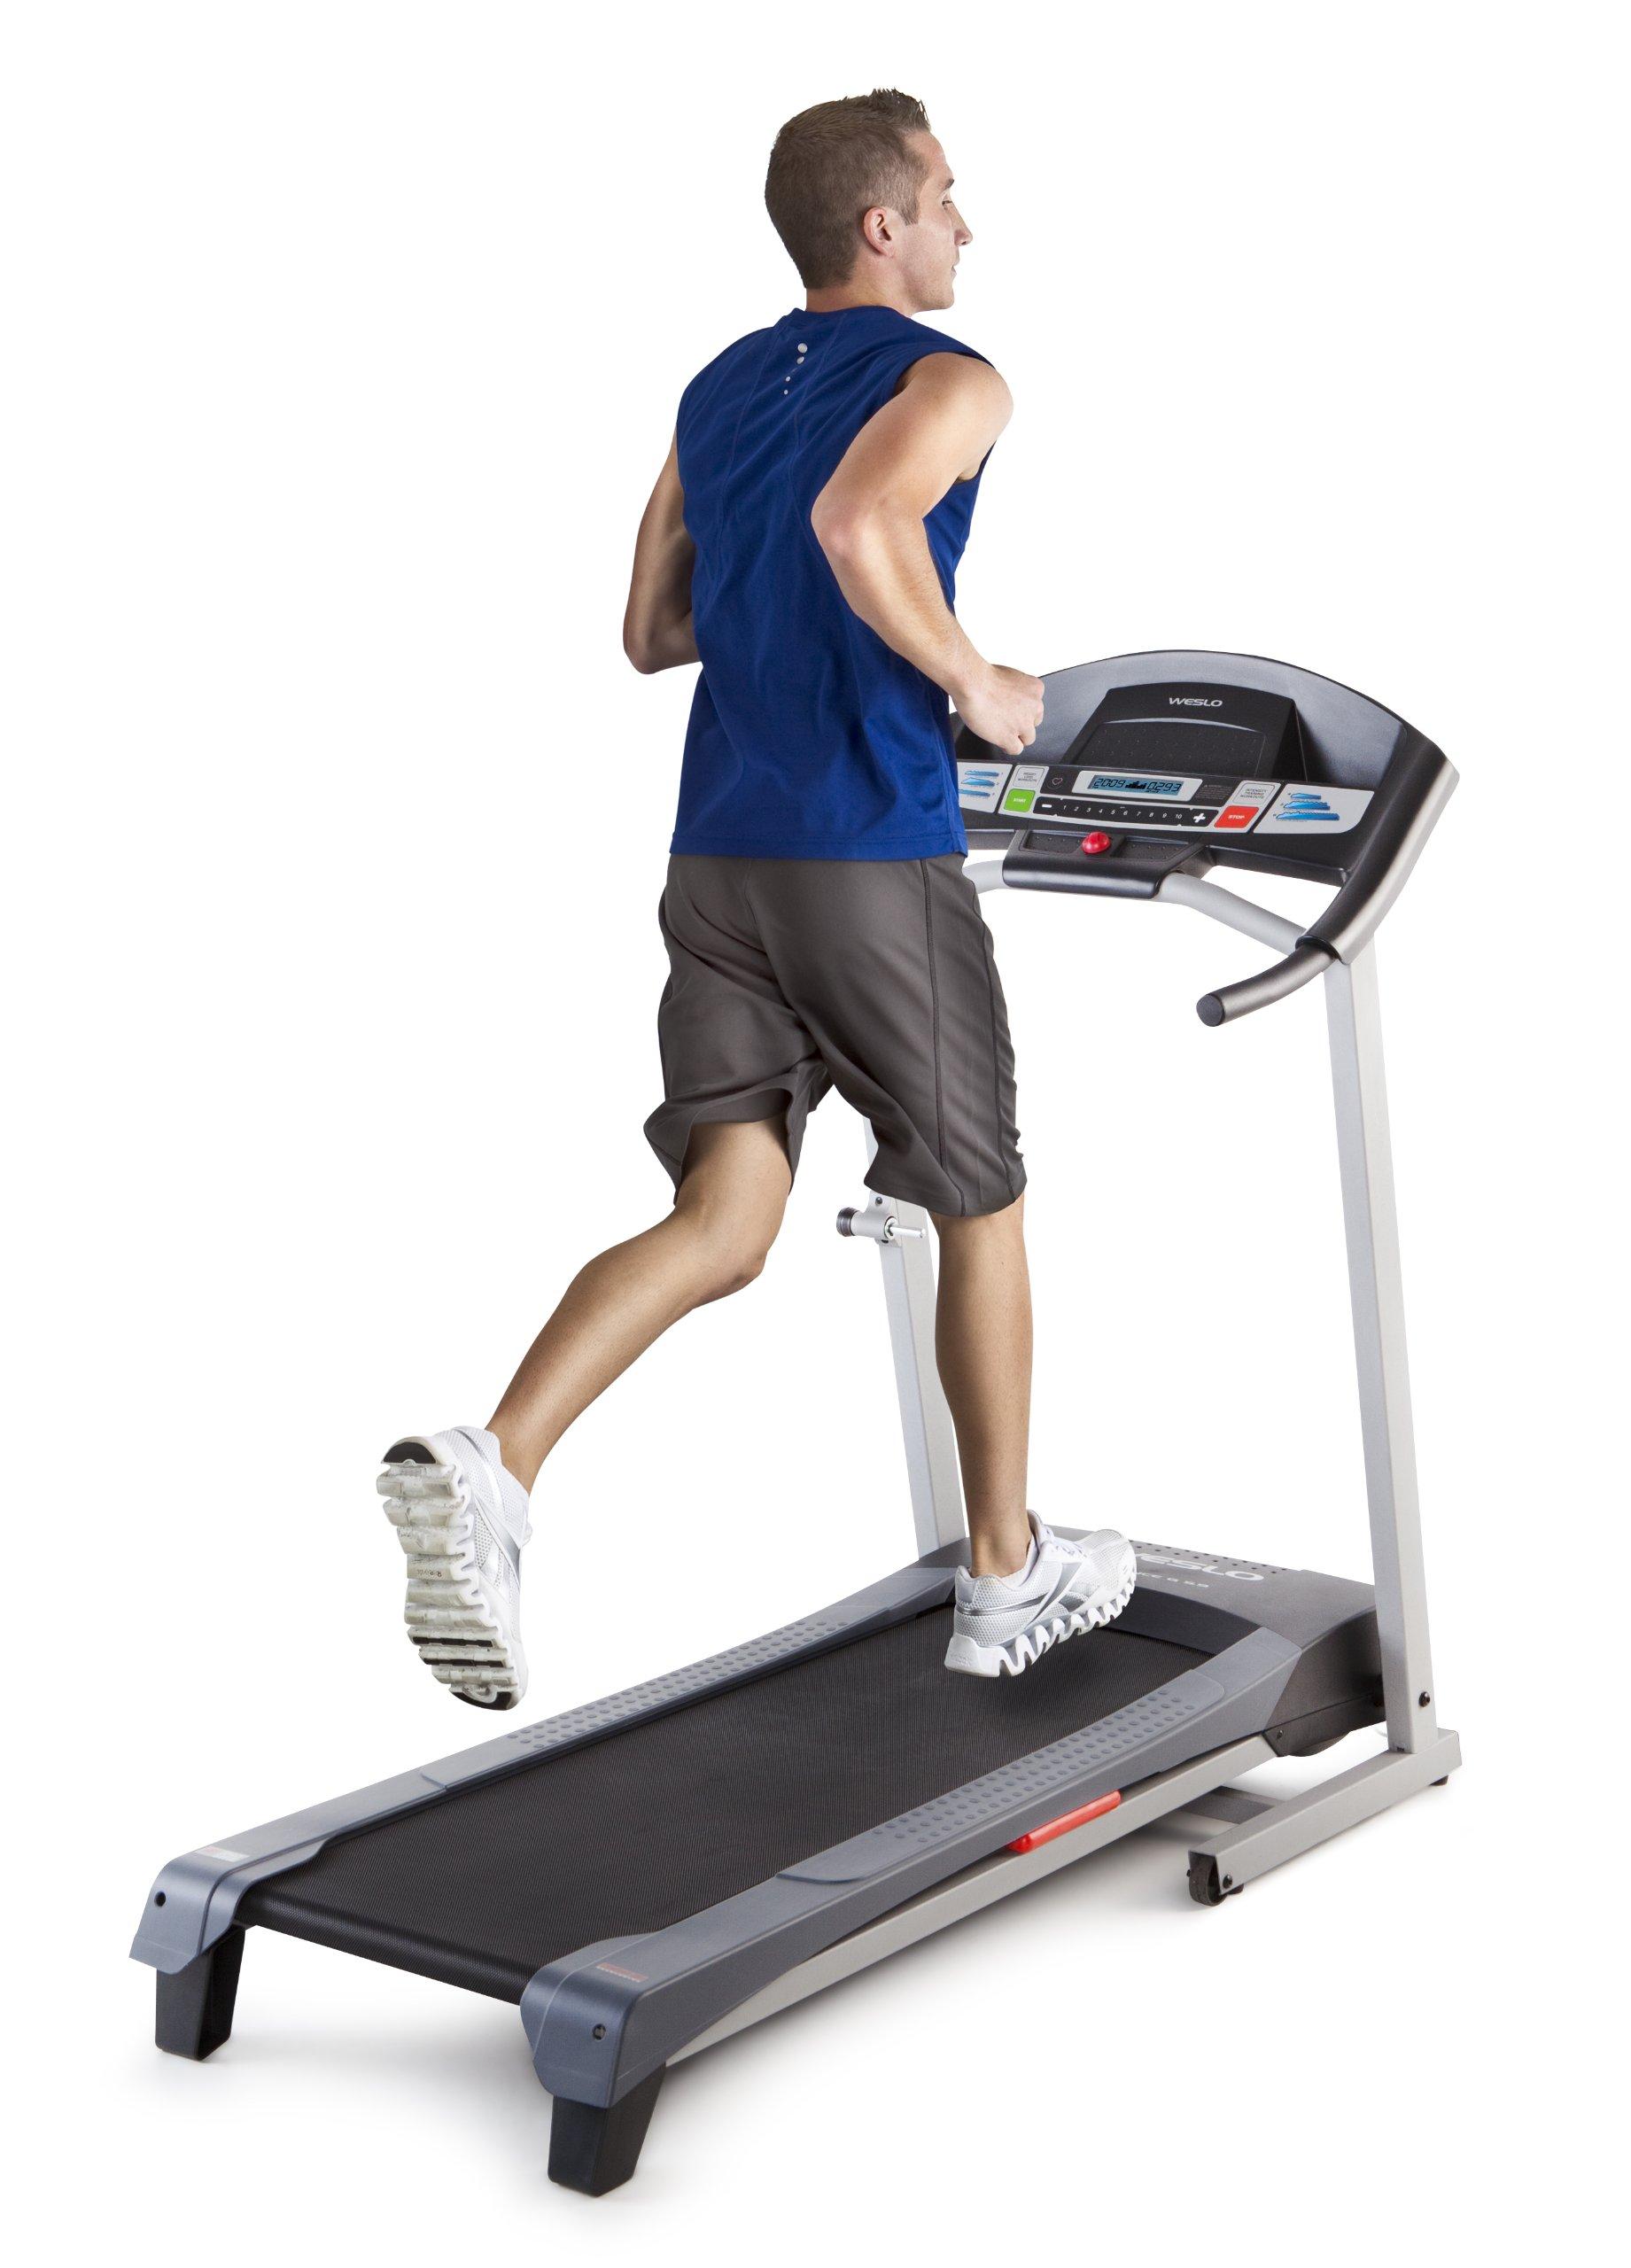 Weslo Cadence G 5.9 Treadmill Series